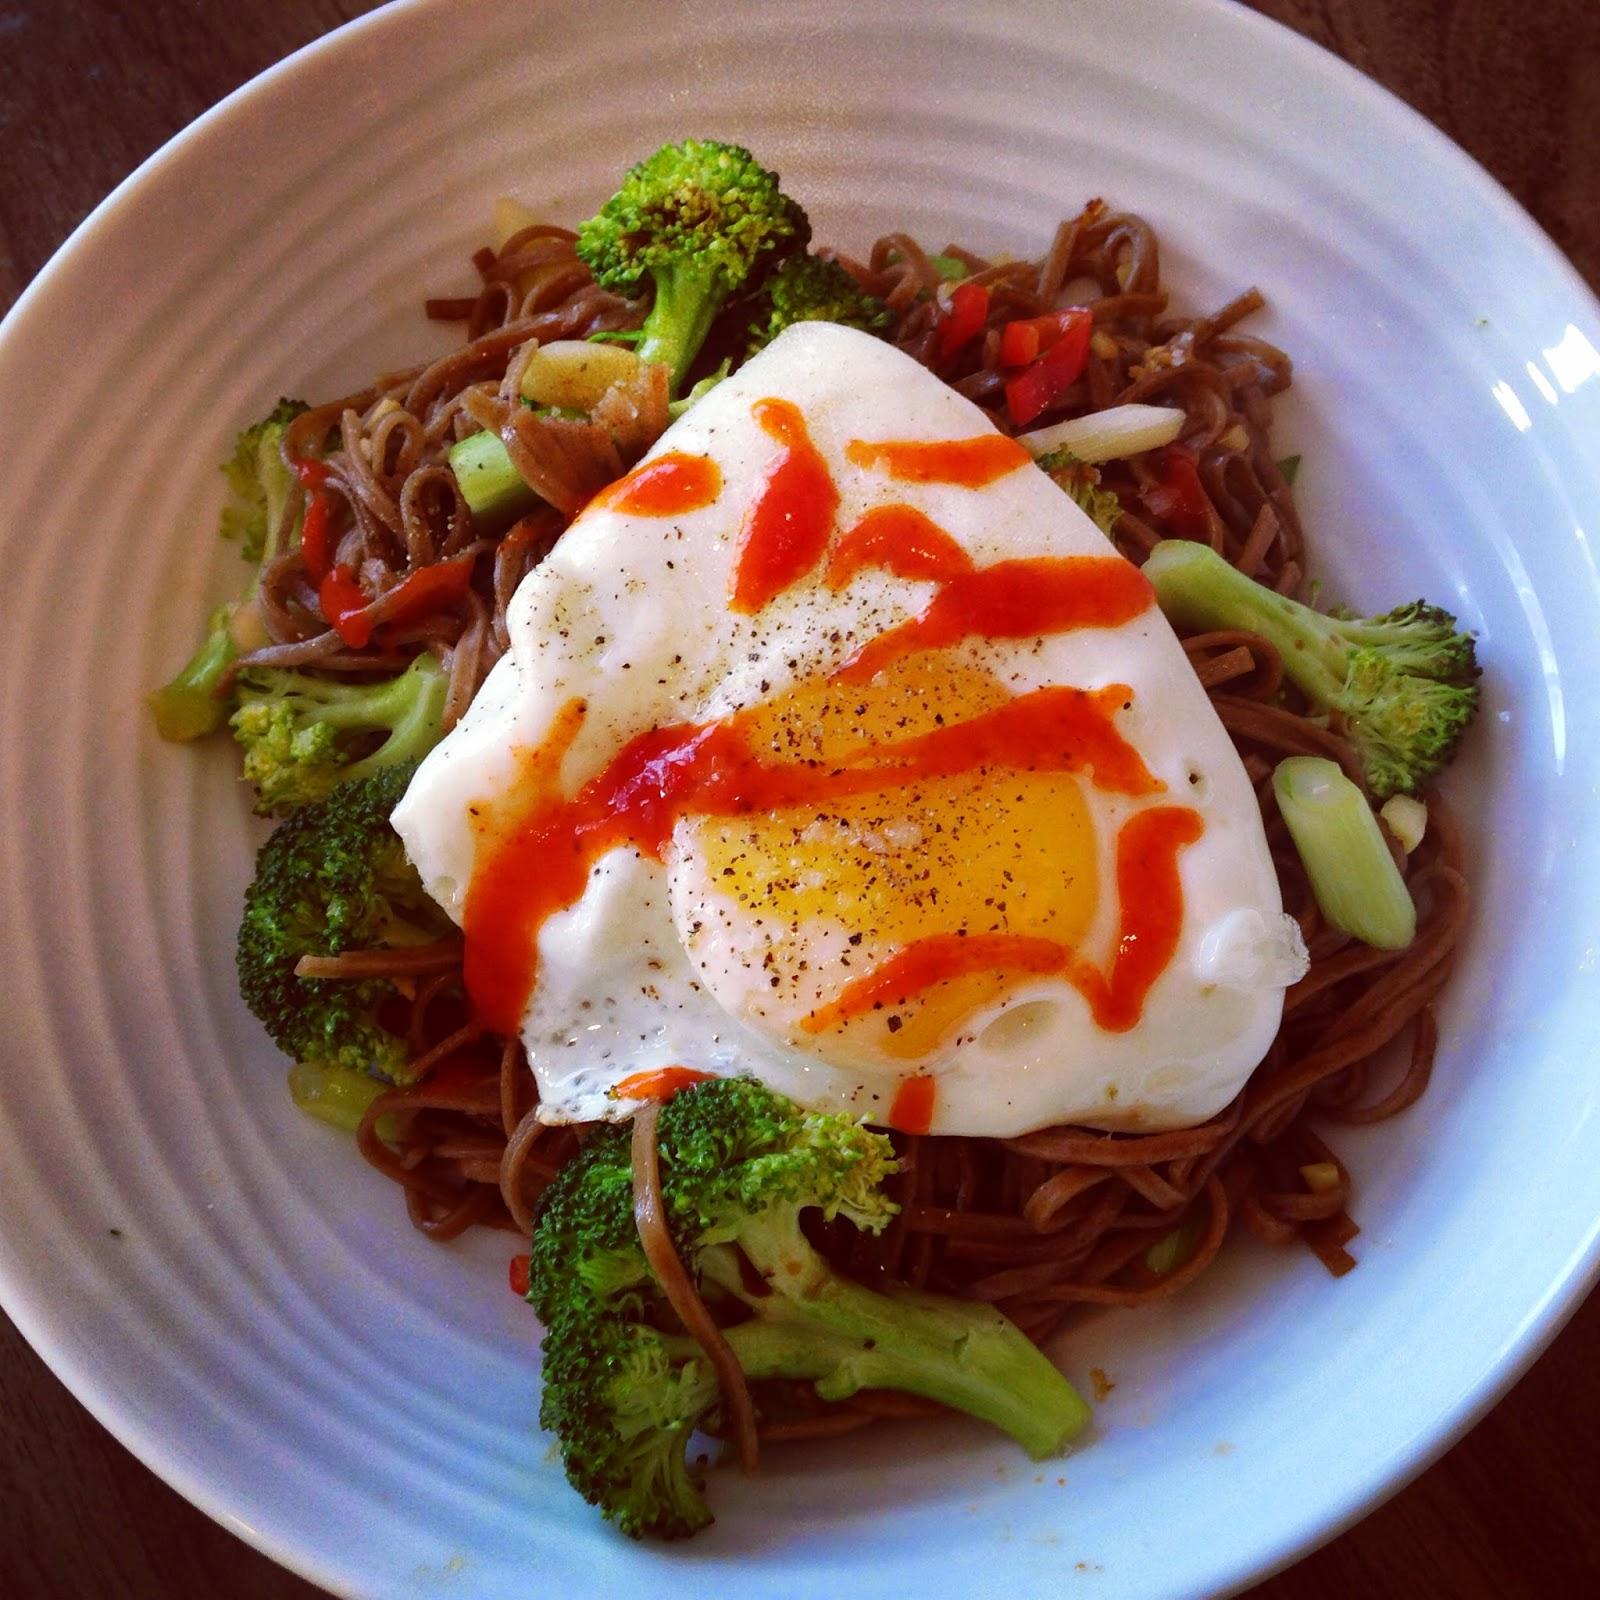 Diana Henry, A Change of Appetite, Soba Noodles, Broccoli noodles, Sriracha sauce, gingey bites